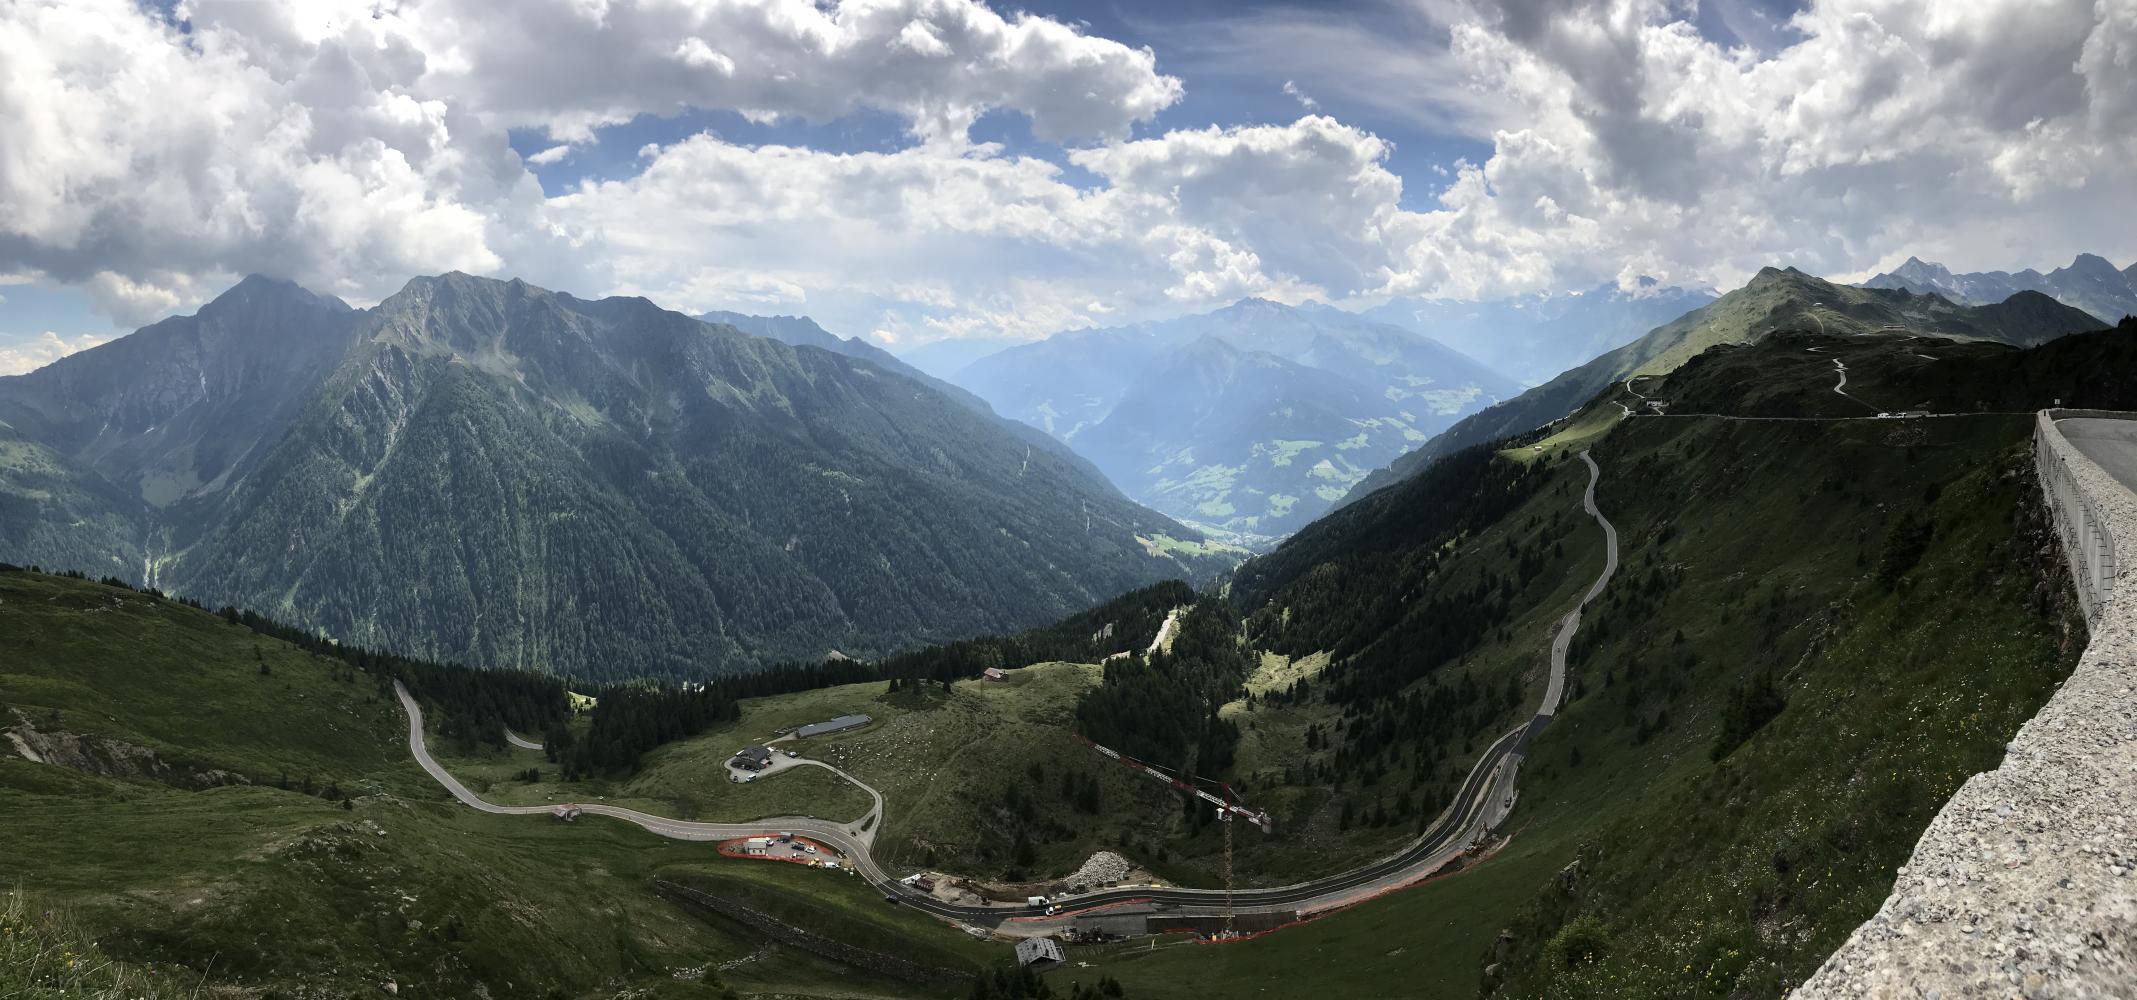 Passo di Monte Giovo (Jaufenpass)  Bike Climb - PJAMM Cycling